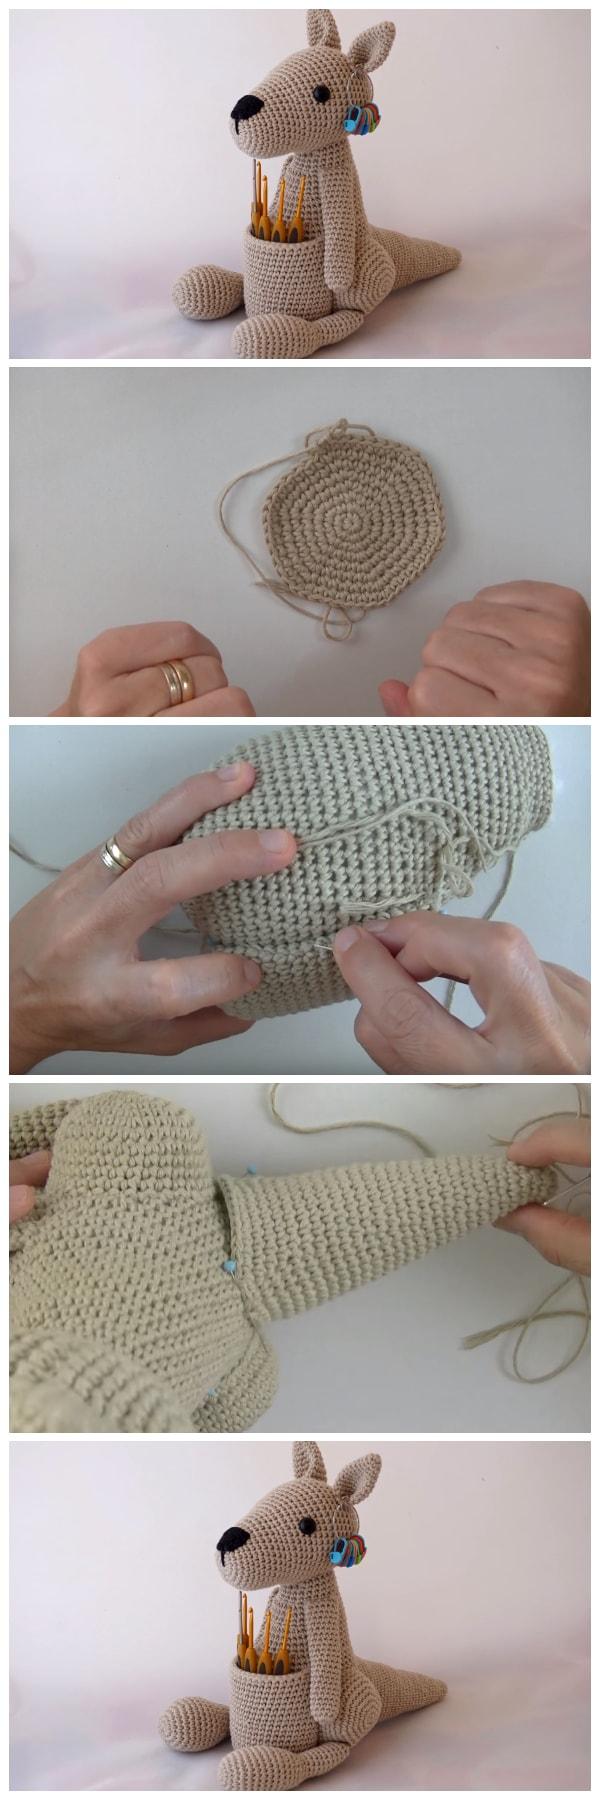 Kangaroo Amigurumi Pattern ⋆ Crochet Kingdom | 1800x600